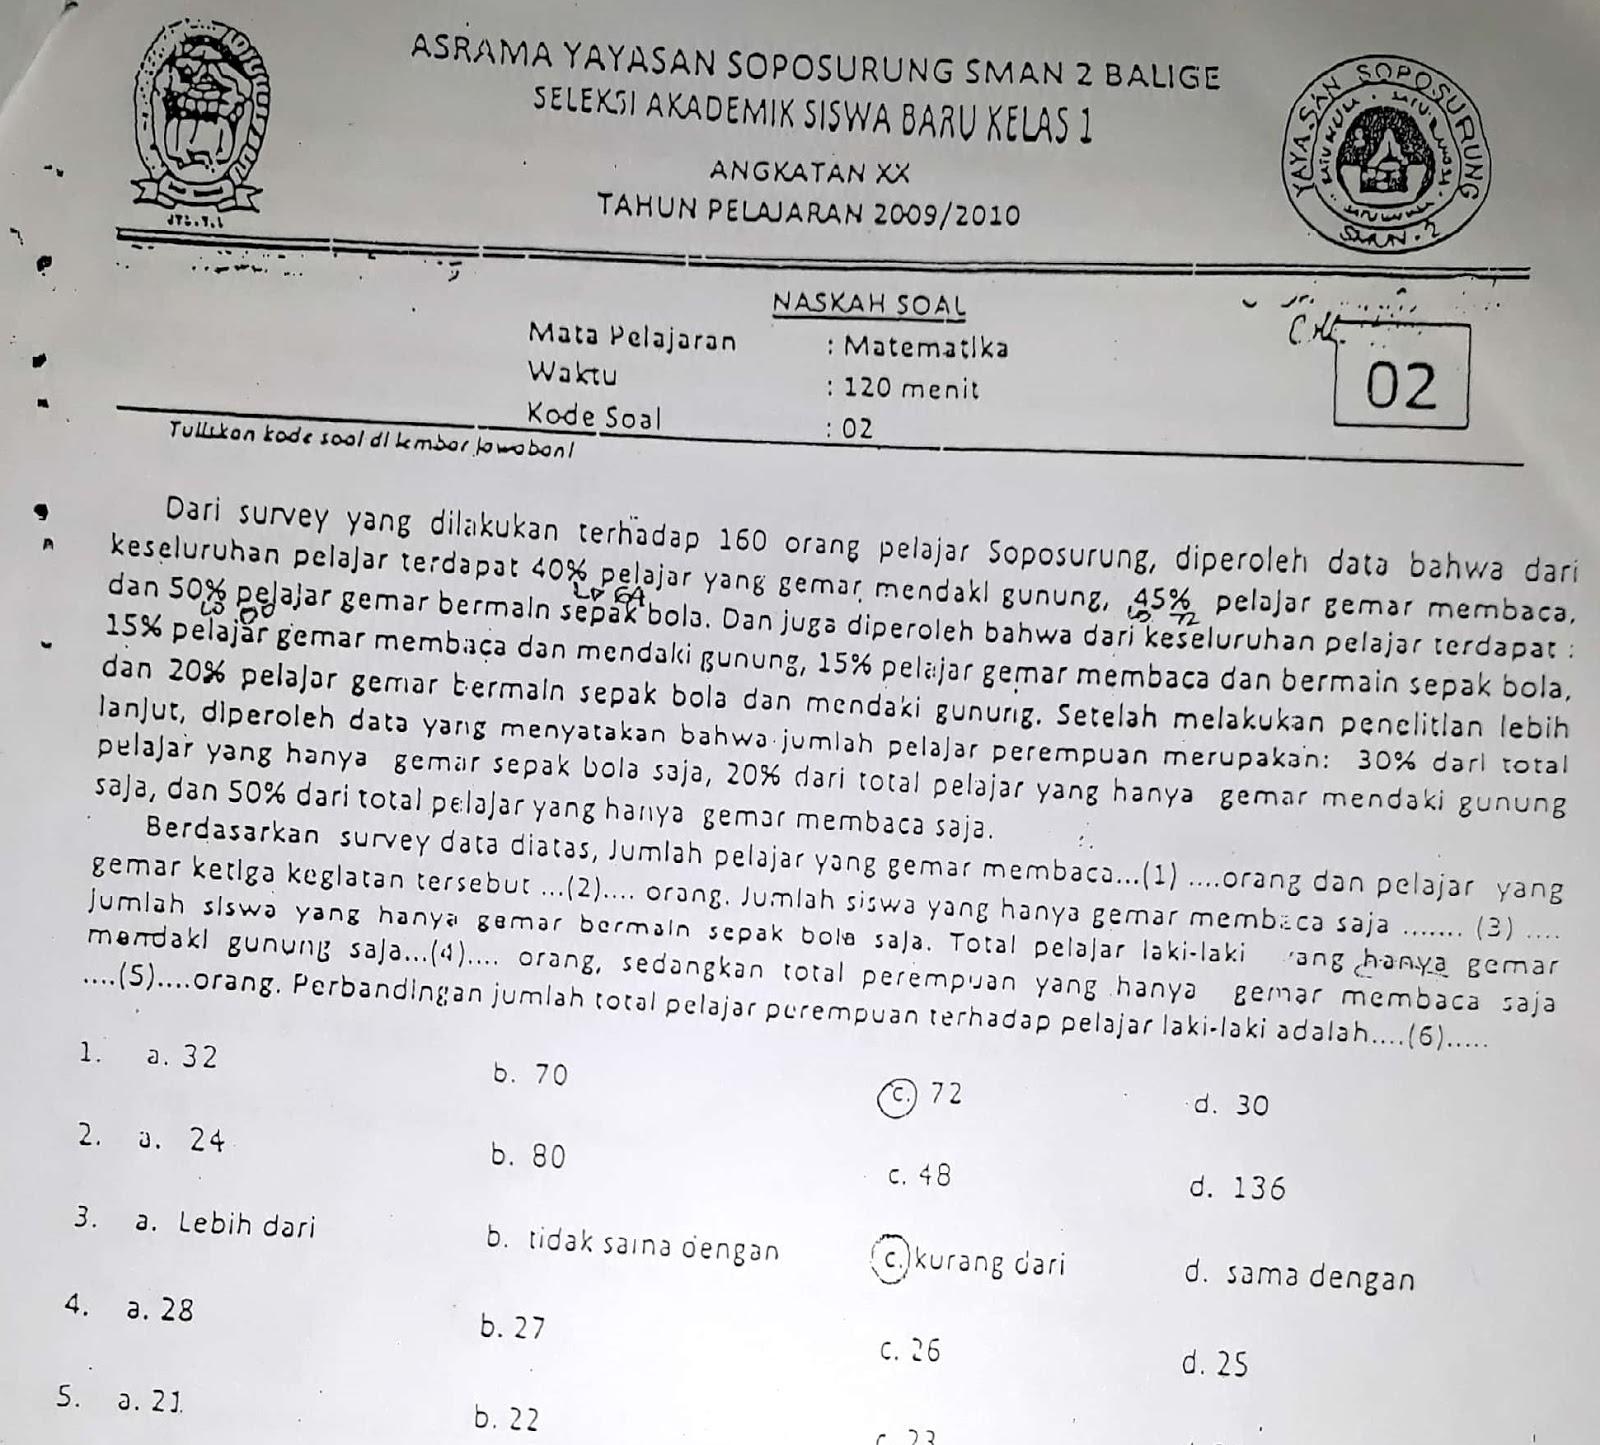 Matematika SMP, Seleksi Akademik Masuk Asrama YASOP SMAN 2 Balige 2009